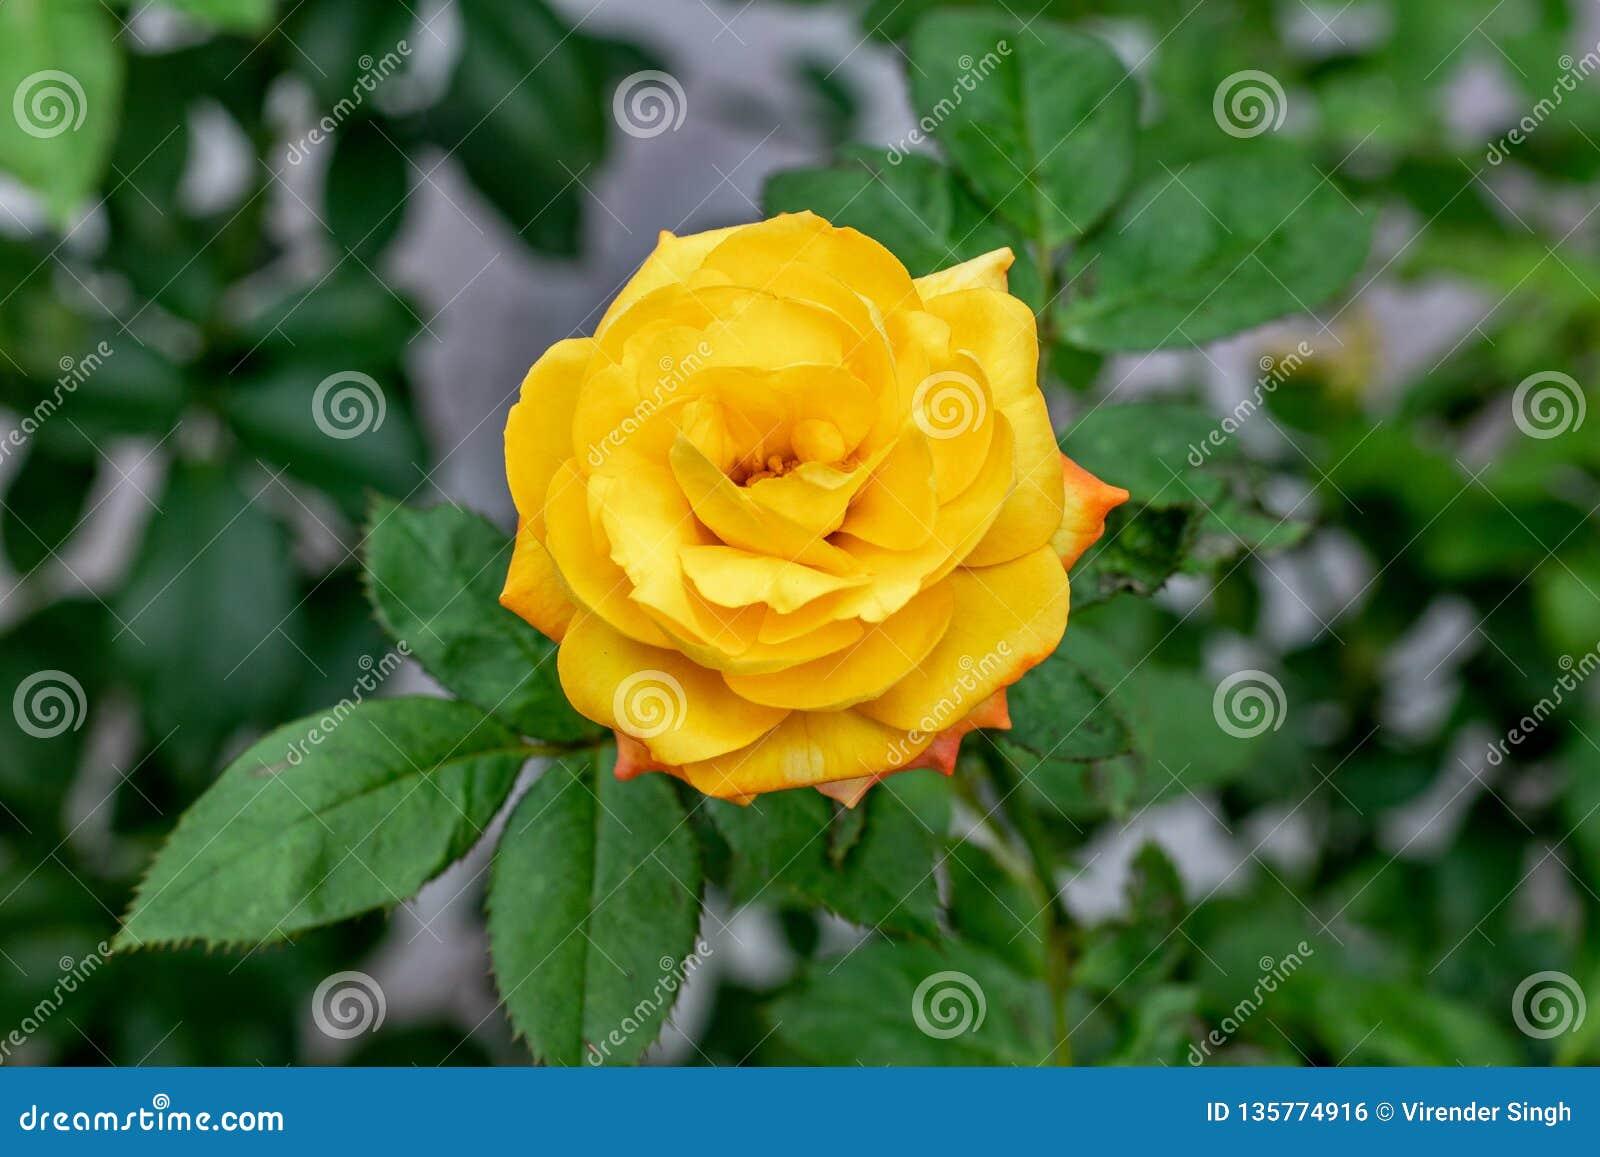 Gul rosa blomstra ros